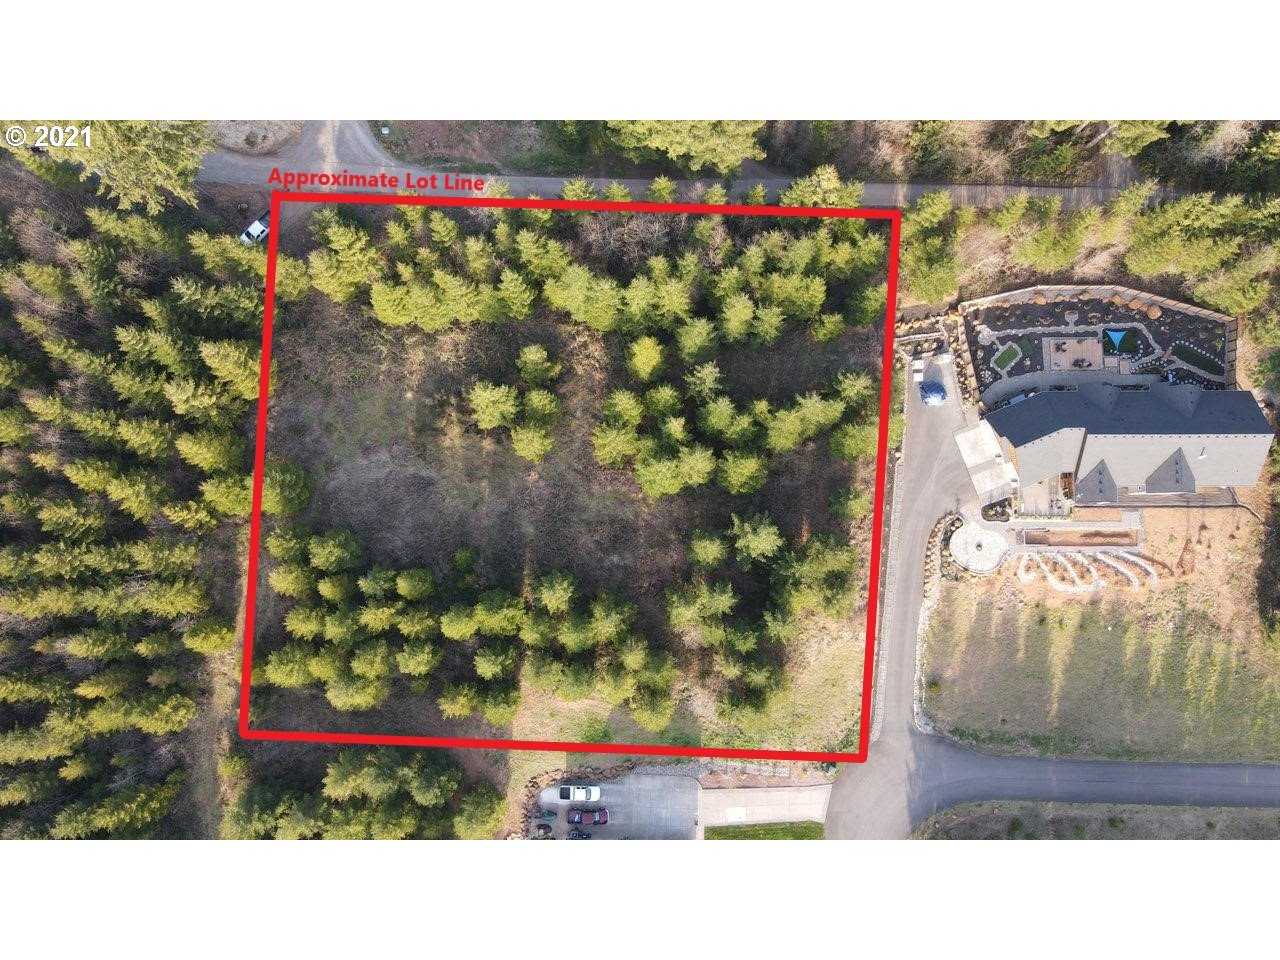 0 NE 211th ST, Battle Ground, Washington 98604, ,Lots And Land,For Sale,0 NE 211th ST,20238099